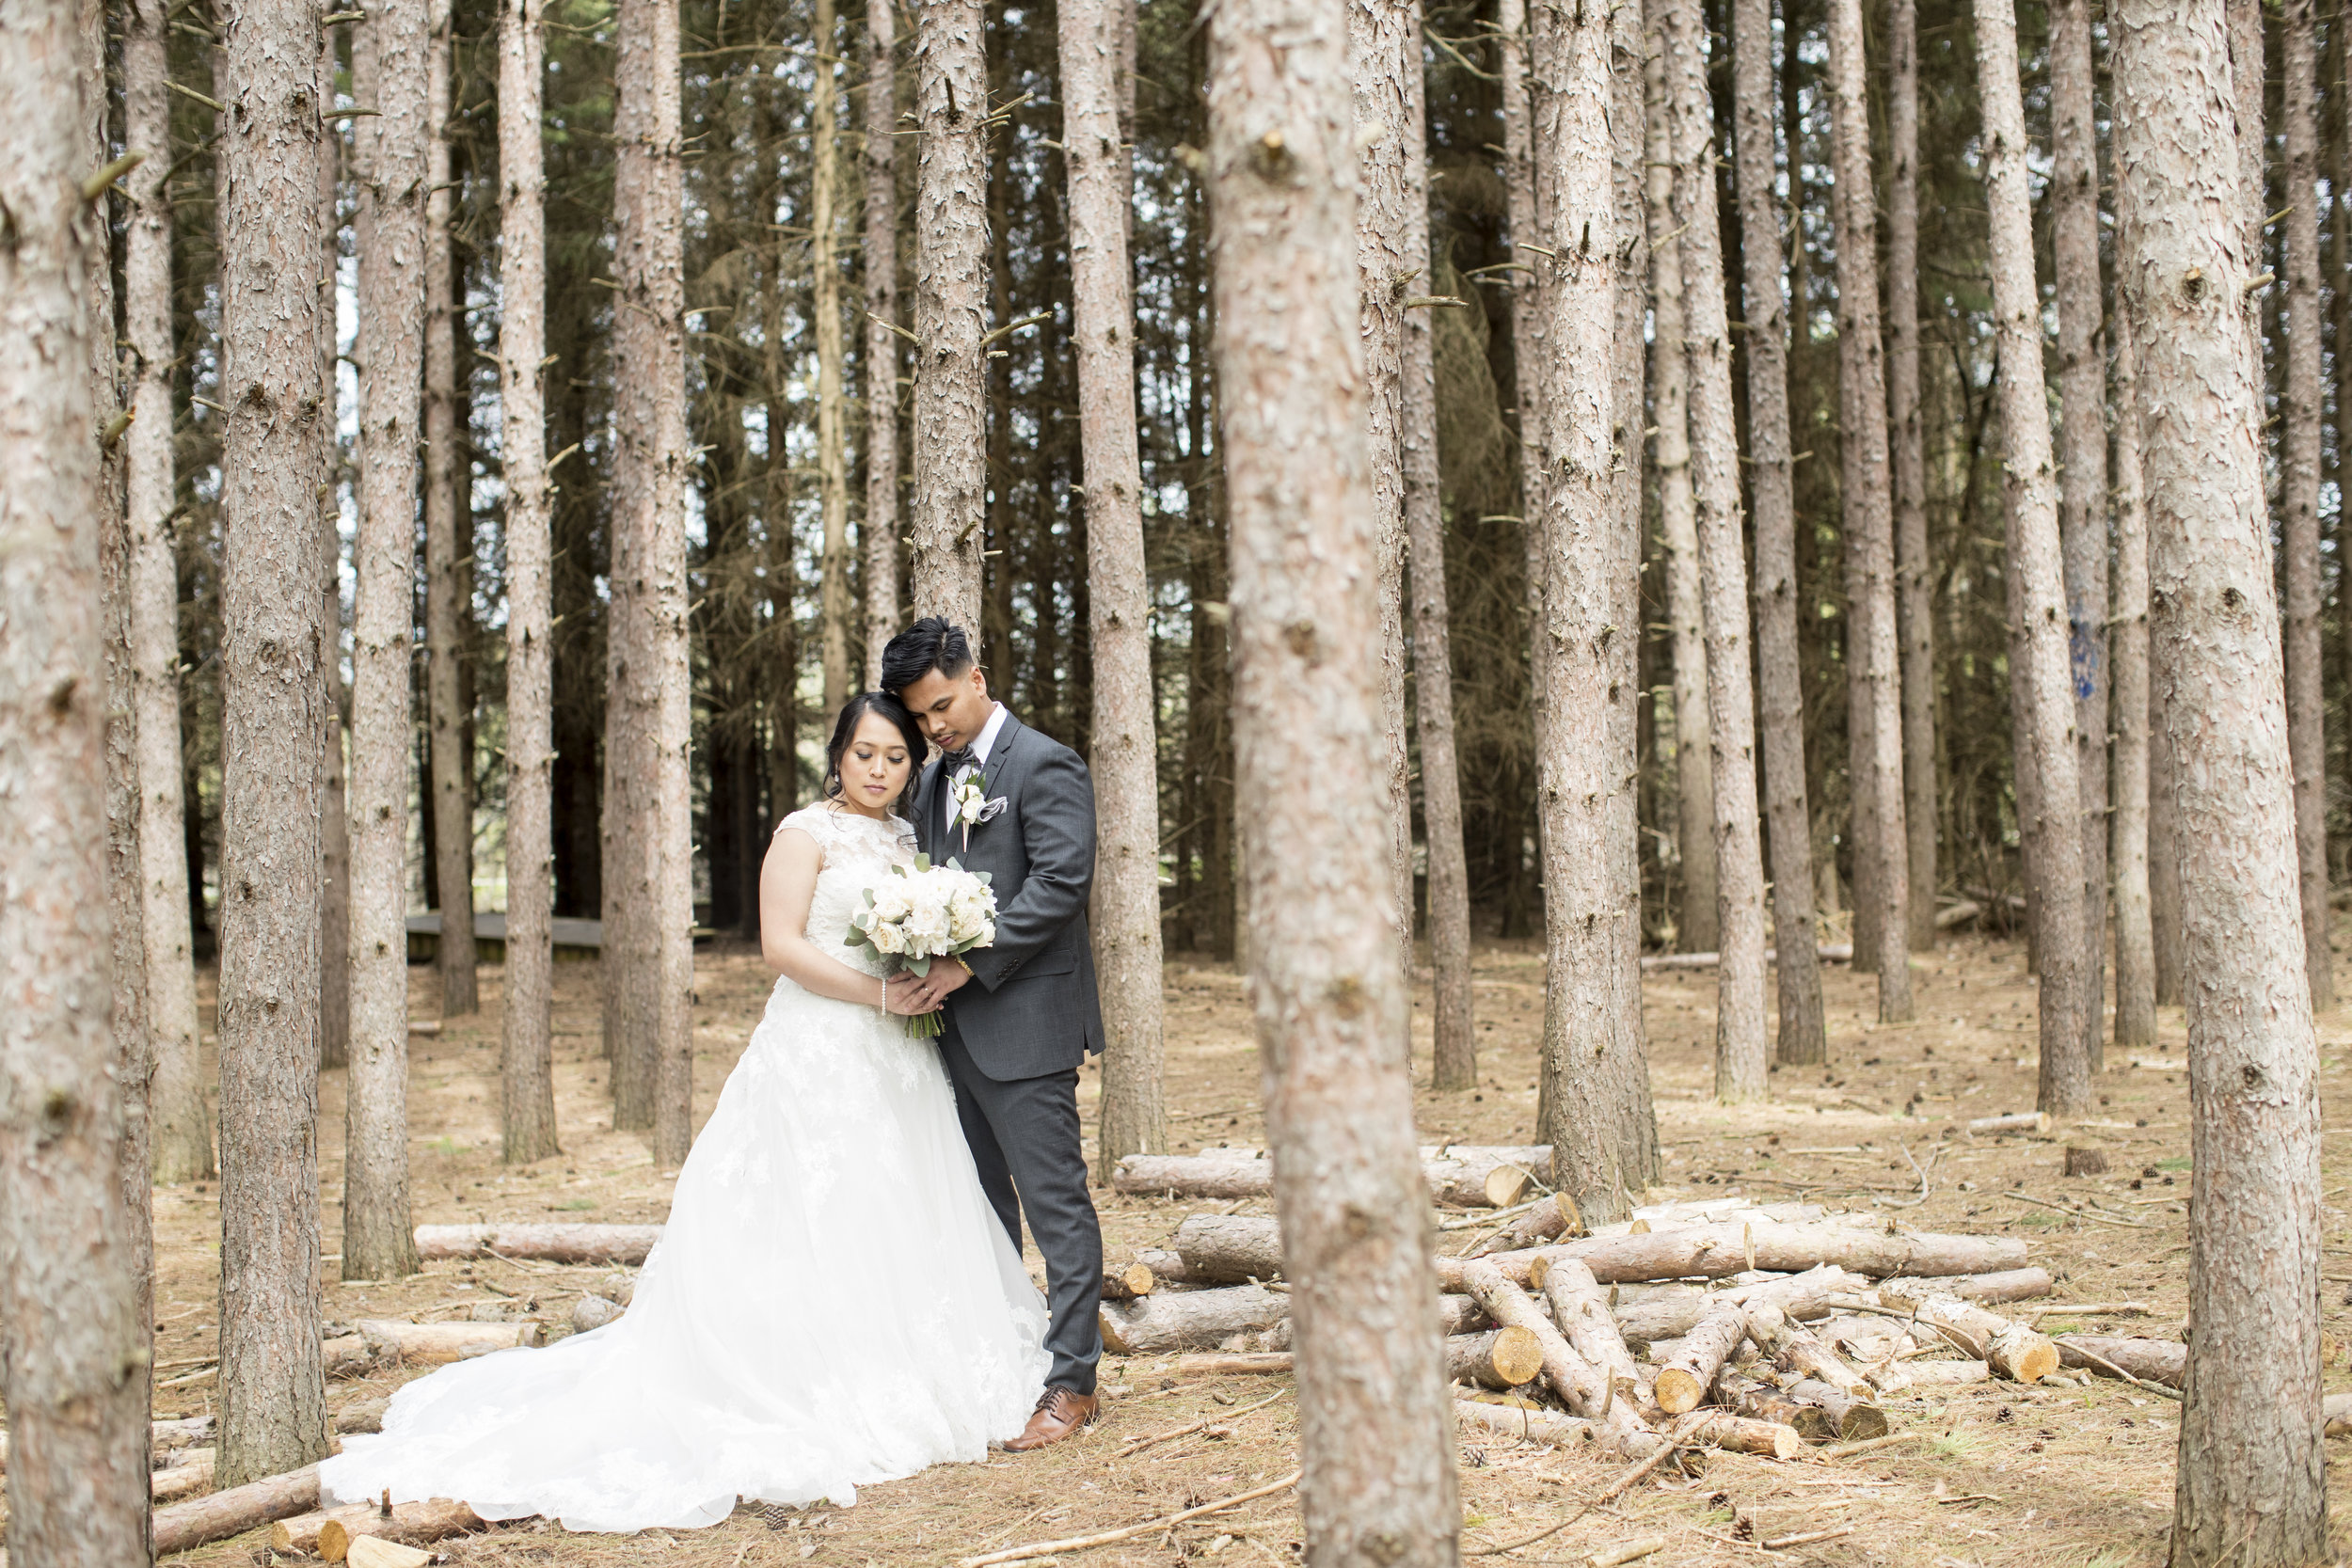 Sheryl & Janrikk - May 11, 2018 // Photographer: Beyond Inifiniti Photography [Coming Soon]